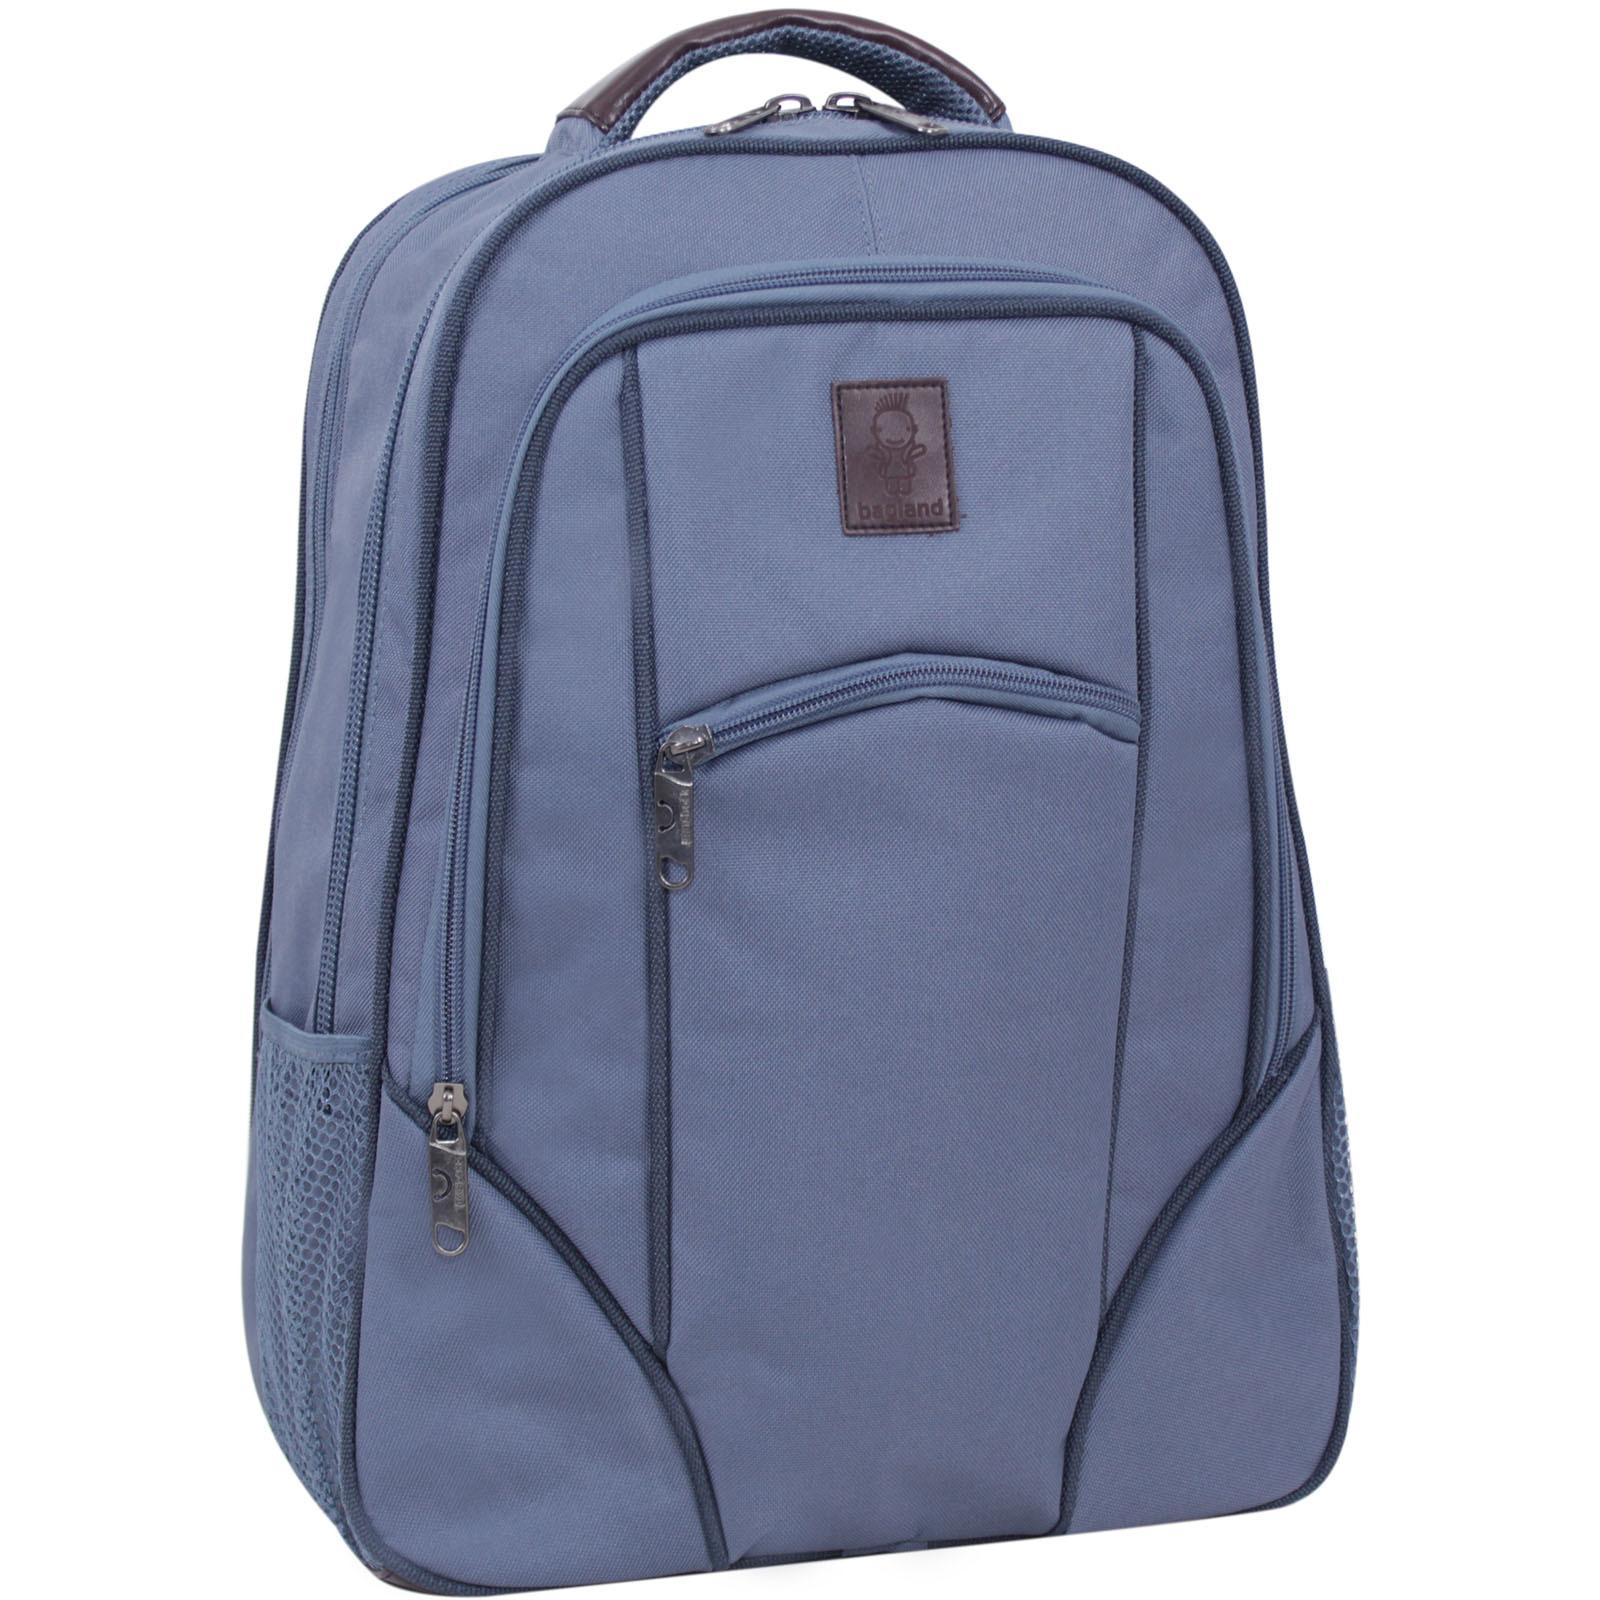 Городские рюкзаки Рюкзак для ноутбука Bagland Рюкзак под ноутбук 537 21 л. Серый (0053766) IMG_8815-1600.jpg